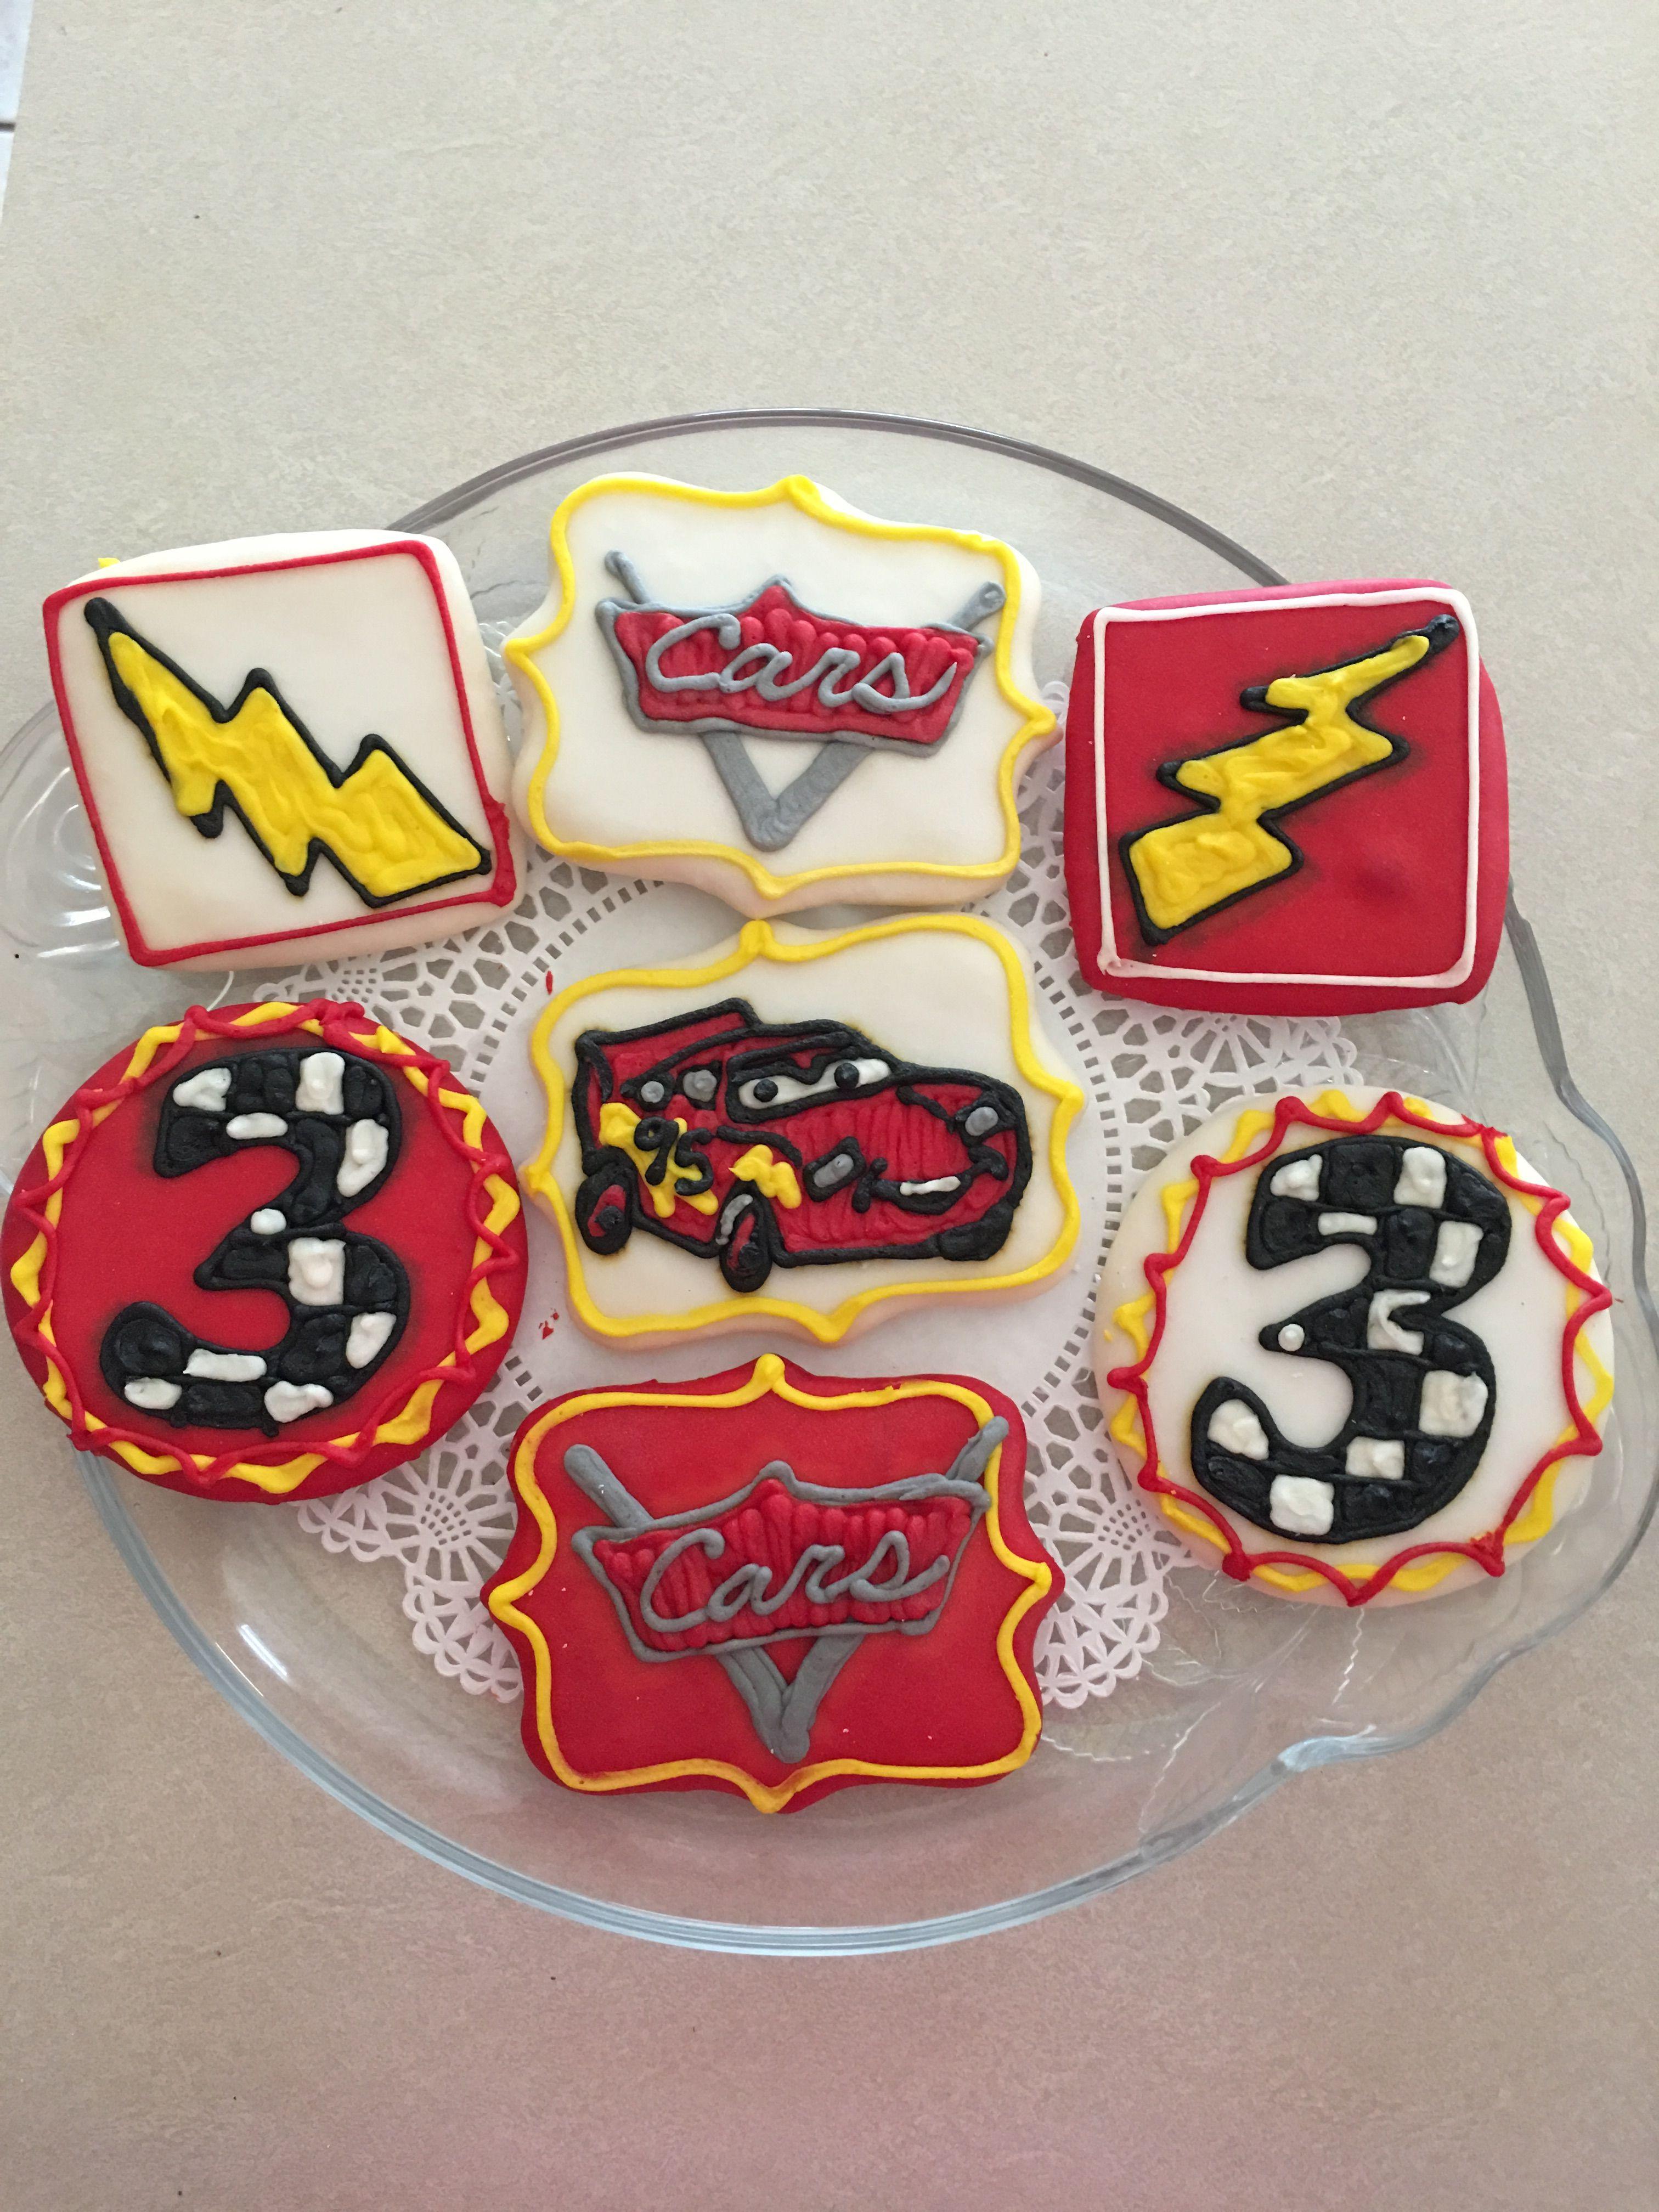 Disney Cars Brysons 3rd Bday Party Sugar Cookies Thank U Savannah